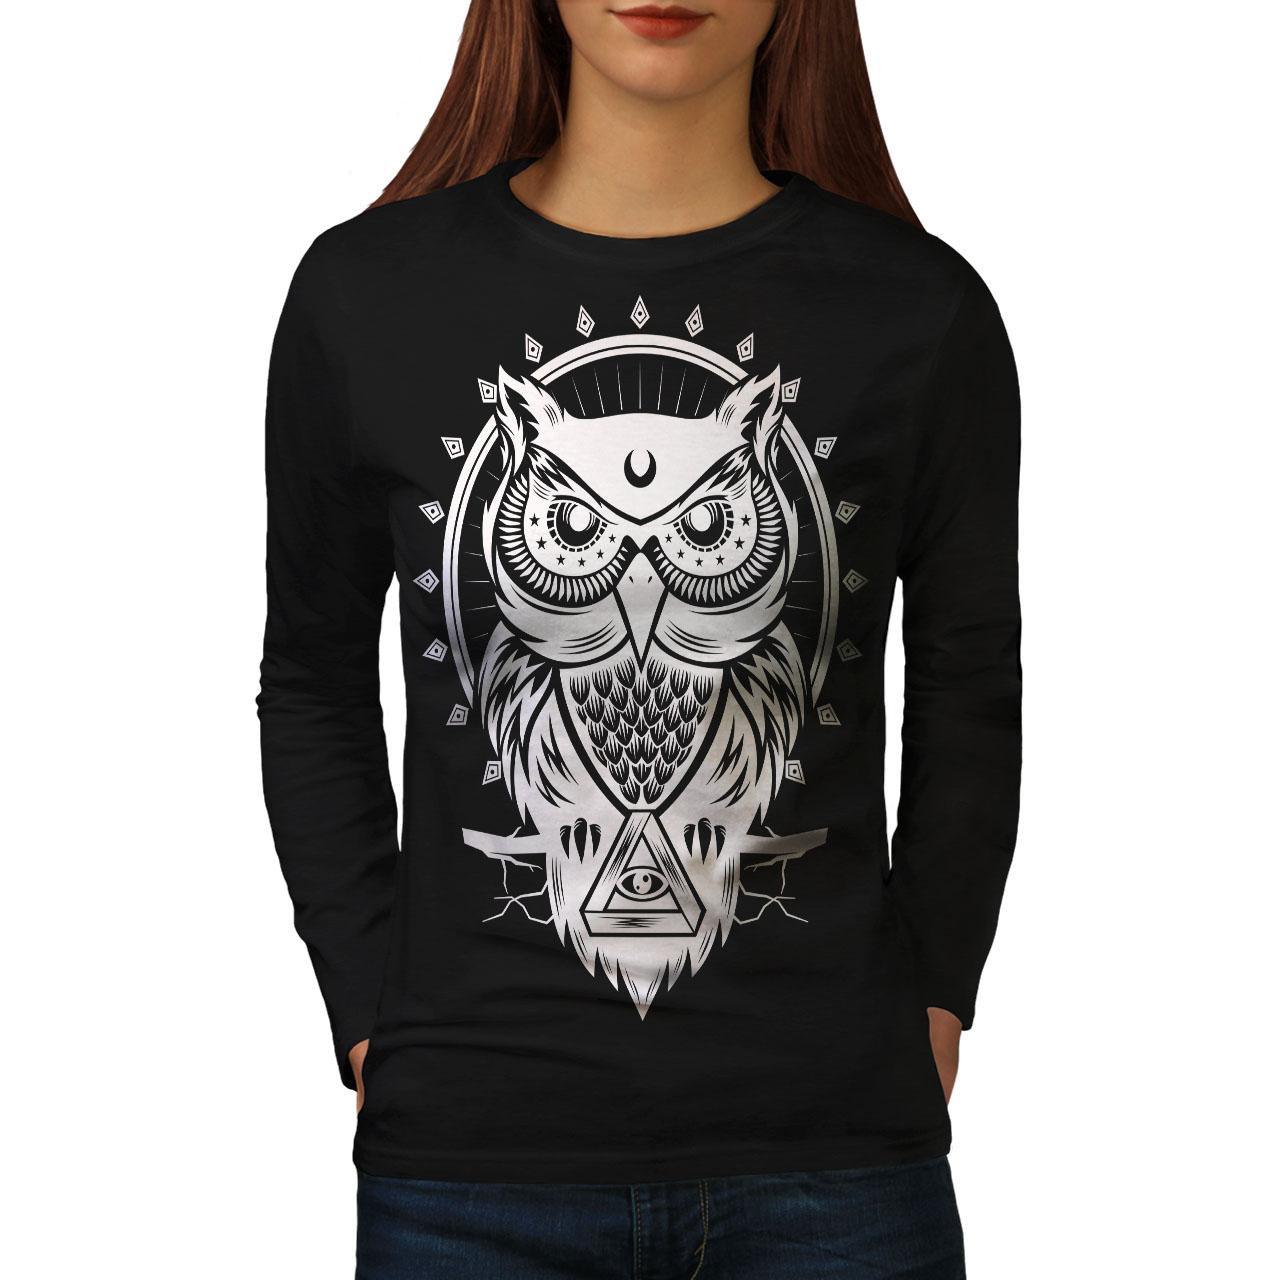 Búho Ojo Illuminati Animal Mujeres Mangas Largas Nuevo Camiseta | Wellcoda